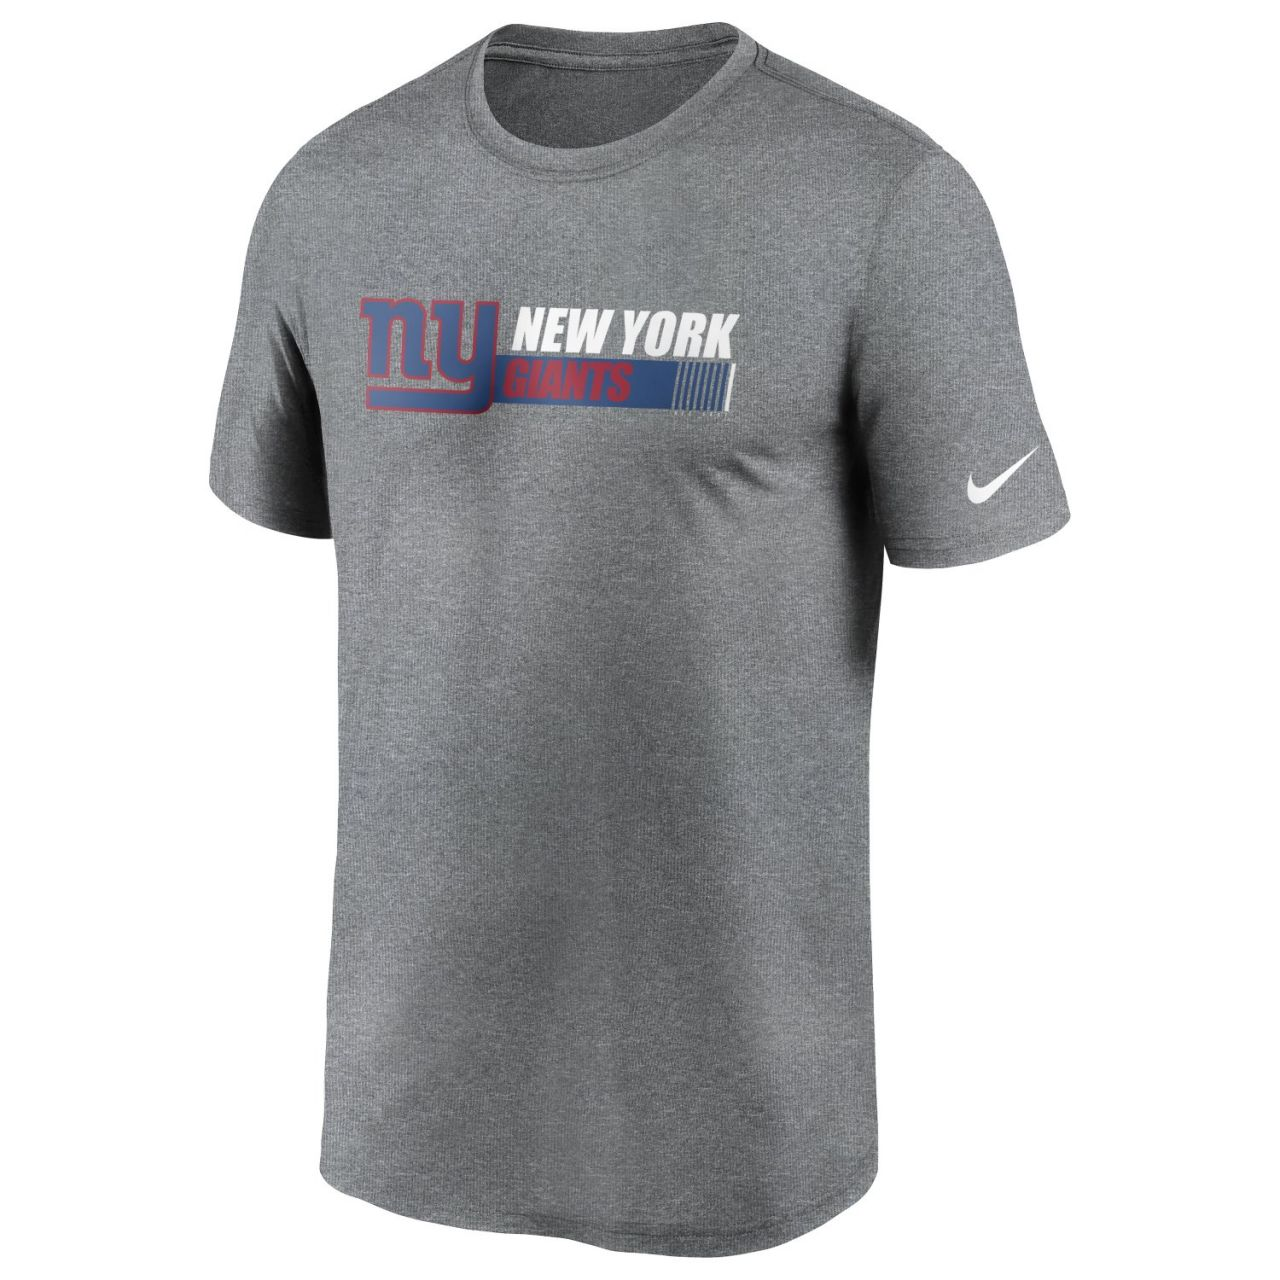 amfoo - Nike Dri-FIT Legend Shirt - PRIMETIME New York Giants